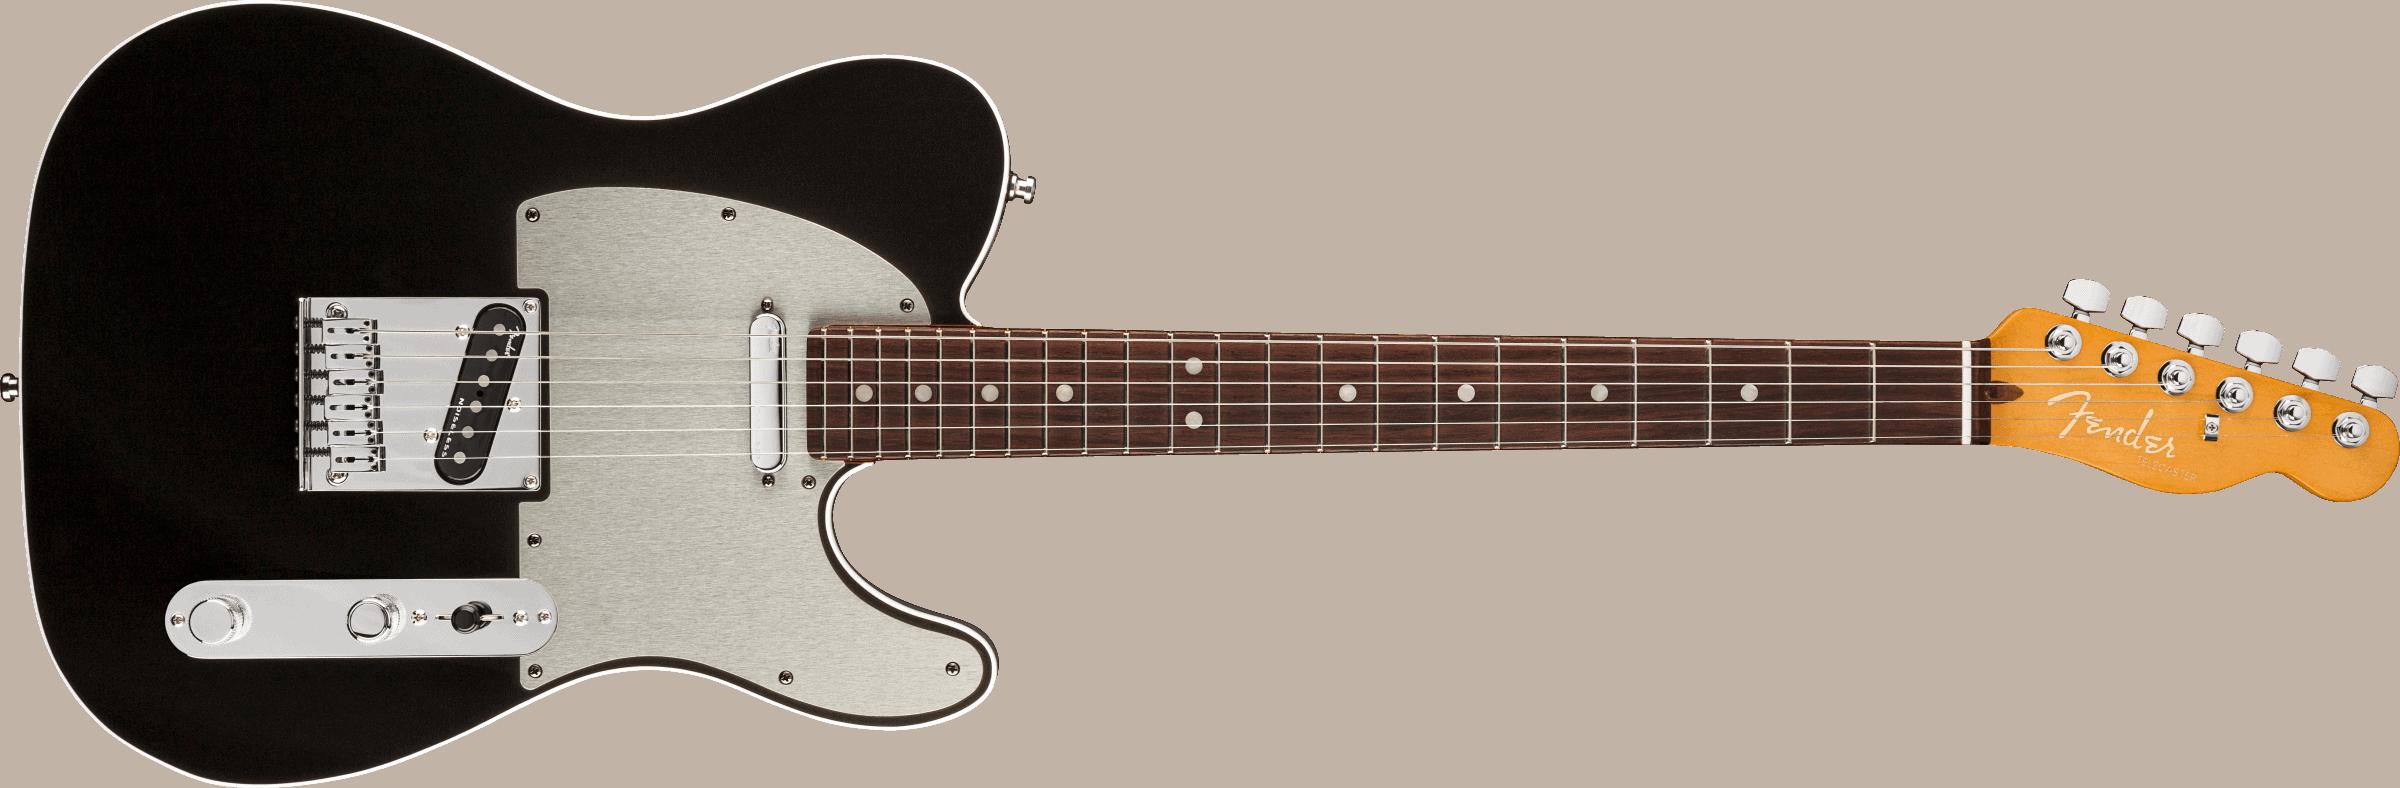 Fender American Ultra Telecaster®, Rosewood Fingerboard, Texas Tea